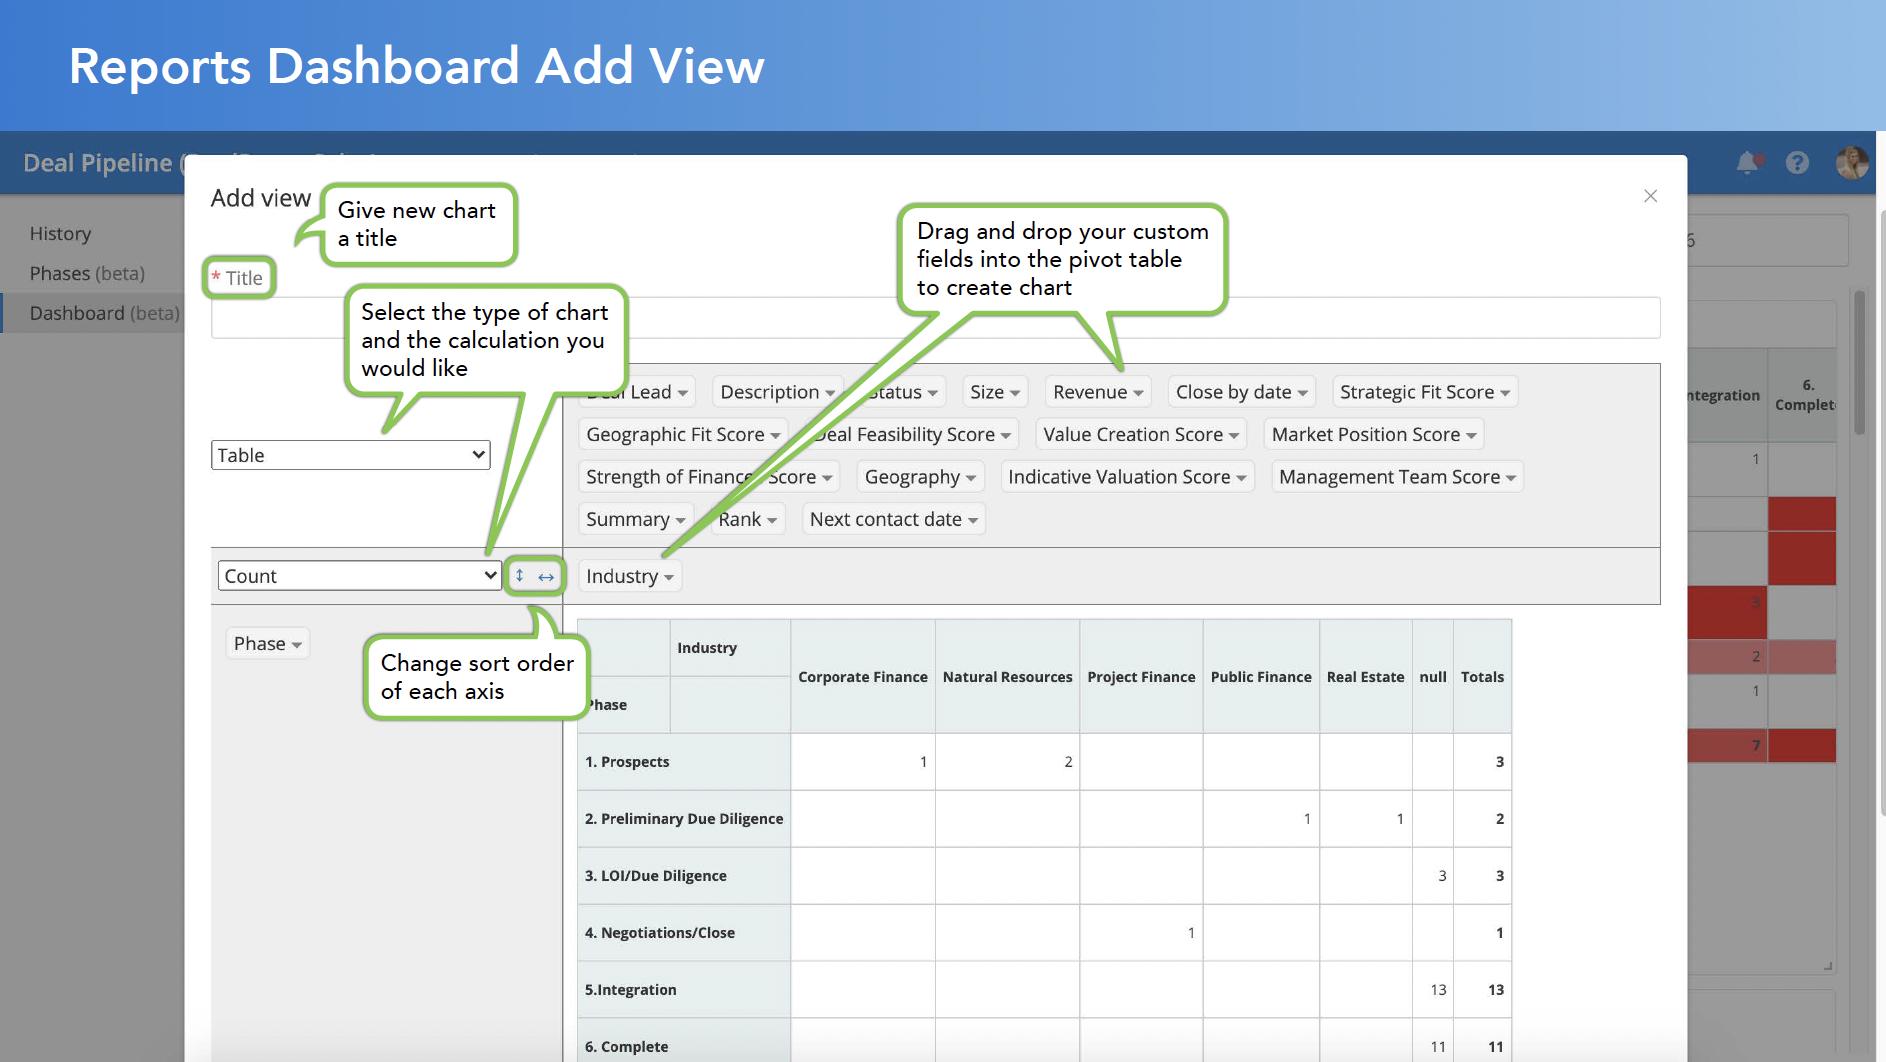 Reports Dashboard Add View